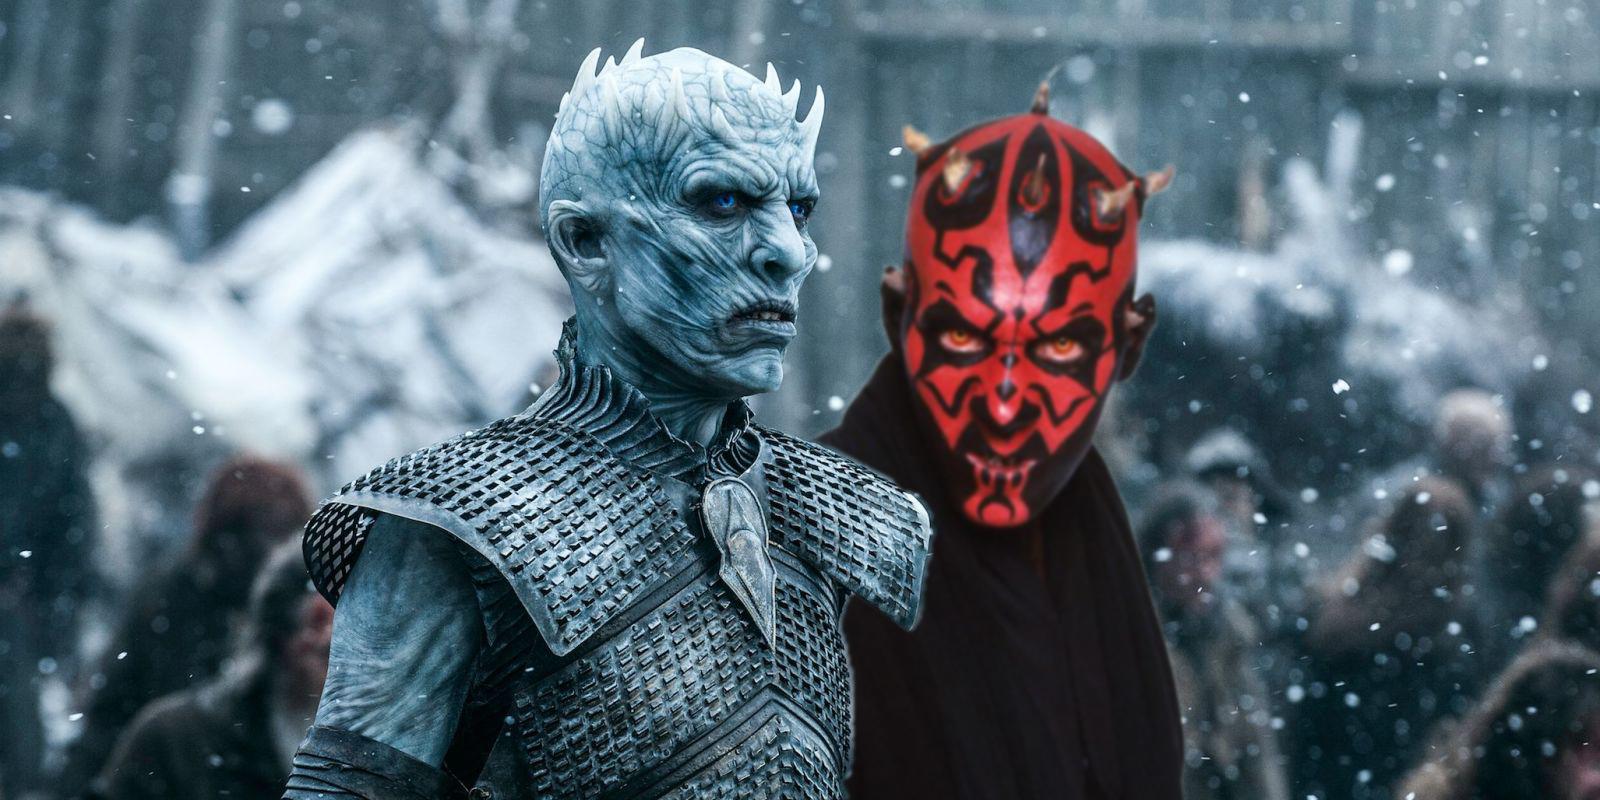 Game Of Thrones Creators Making Star Wars Movies Is Troubling